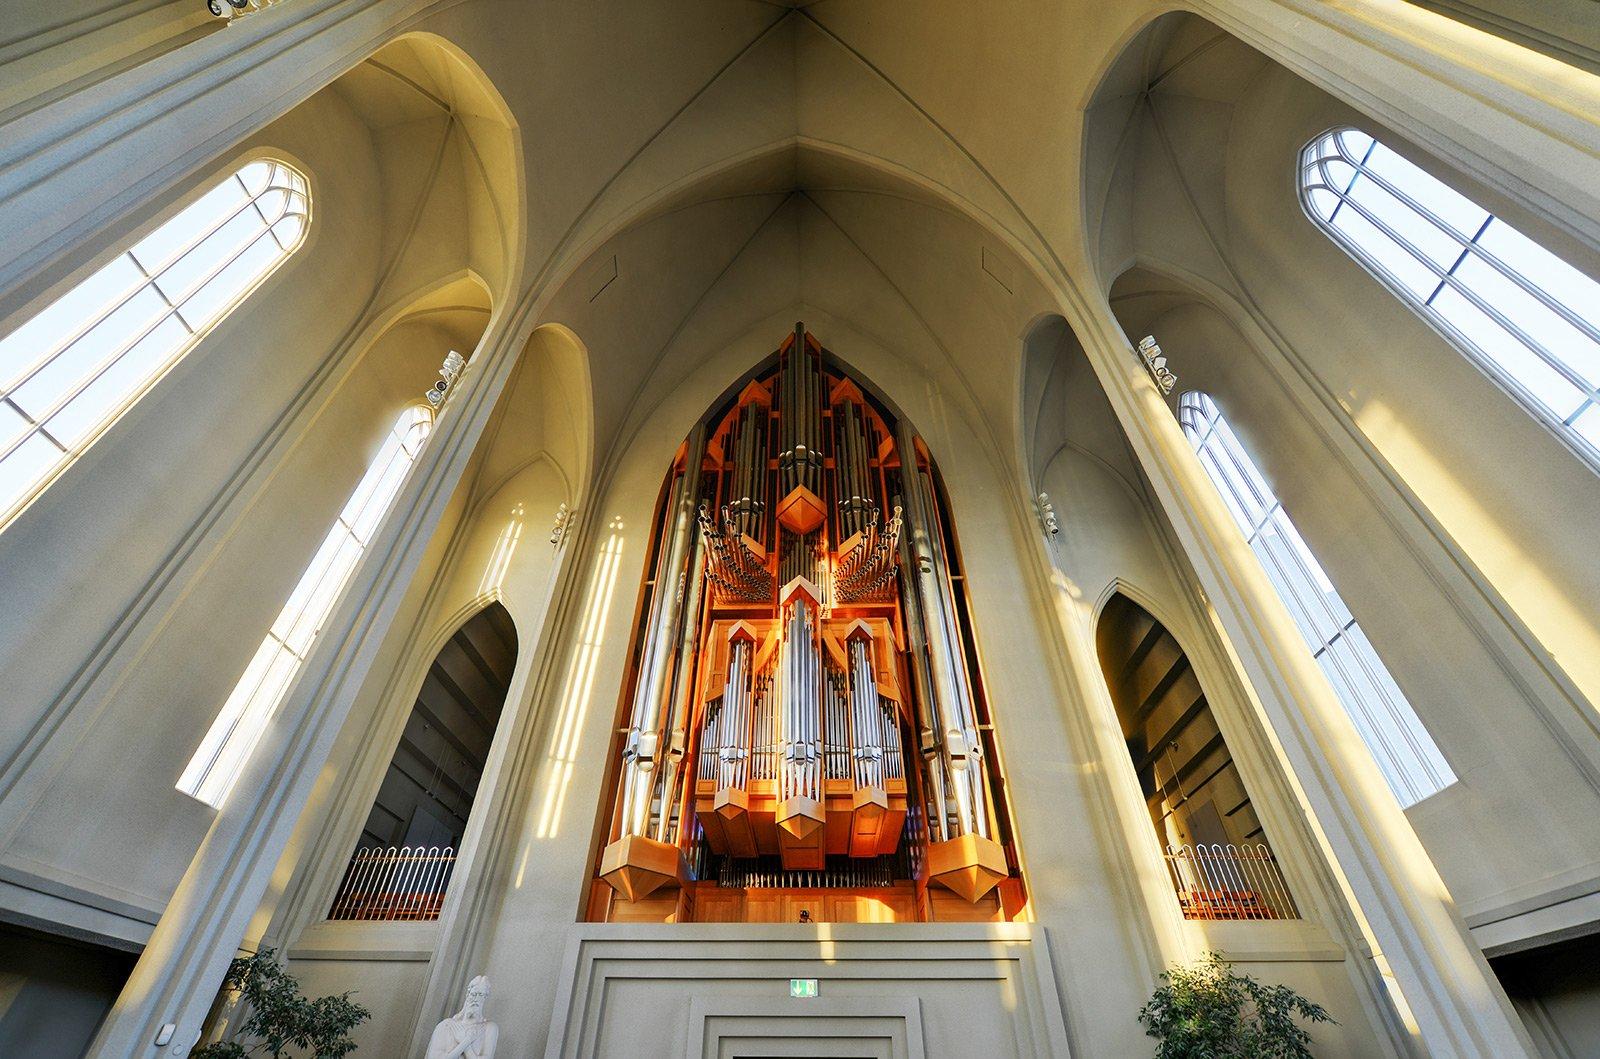 How to listen to organ music in the Hallgrímskirkja in Reykjavik